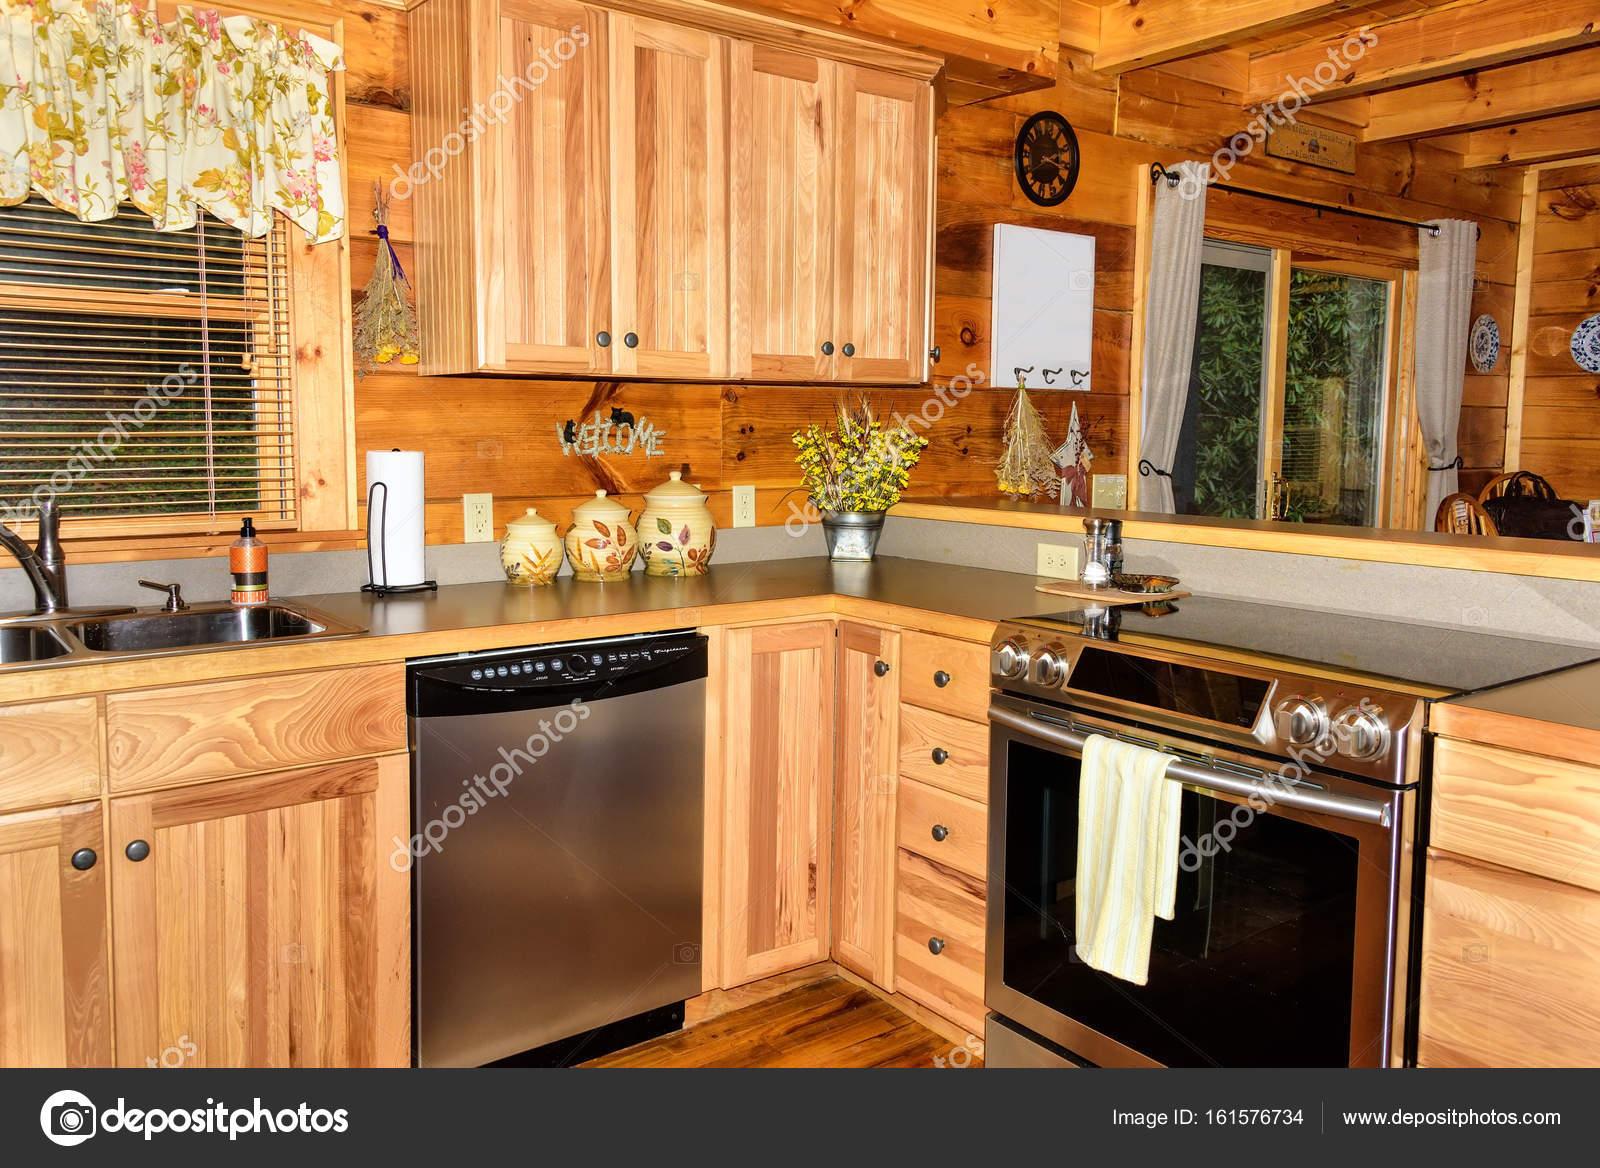 Küche in Kabine — Stockfoto © TallyPic #161576734